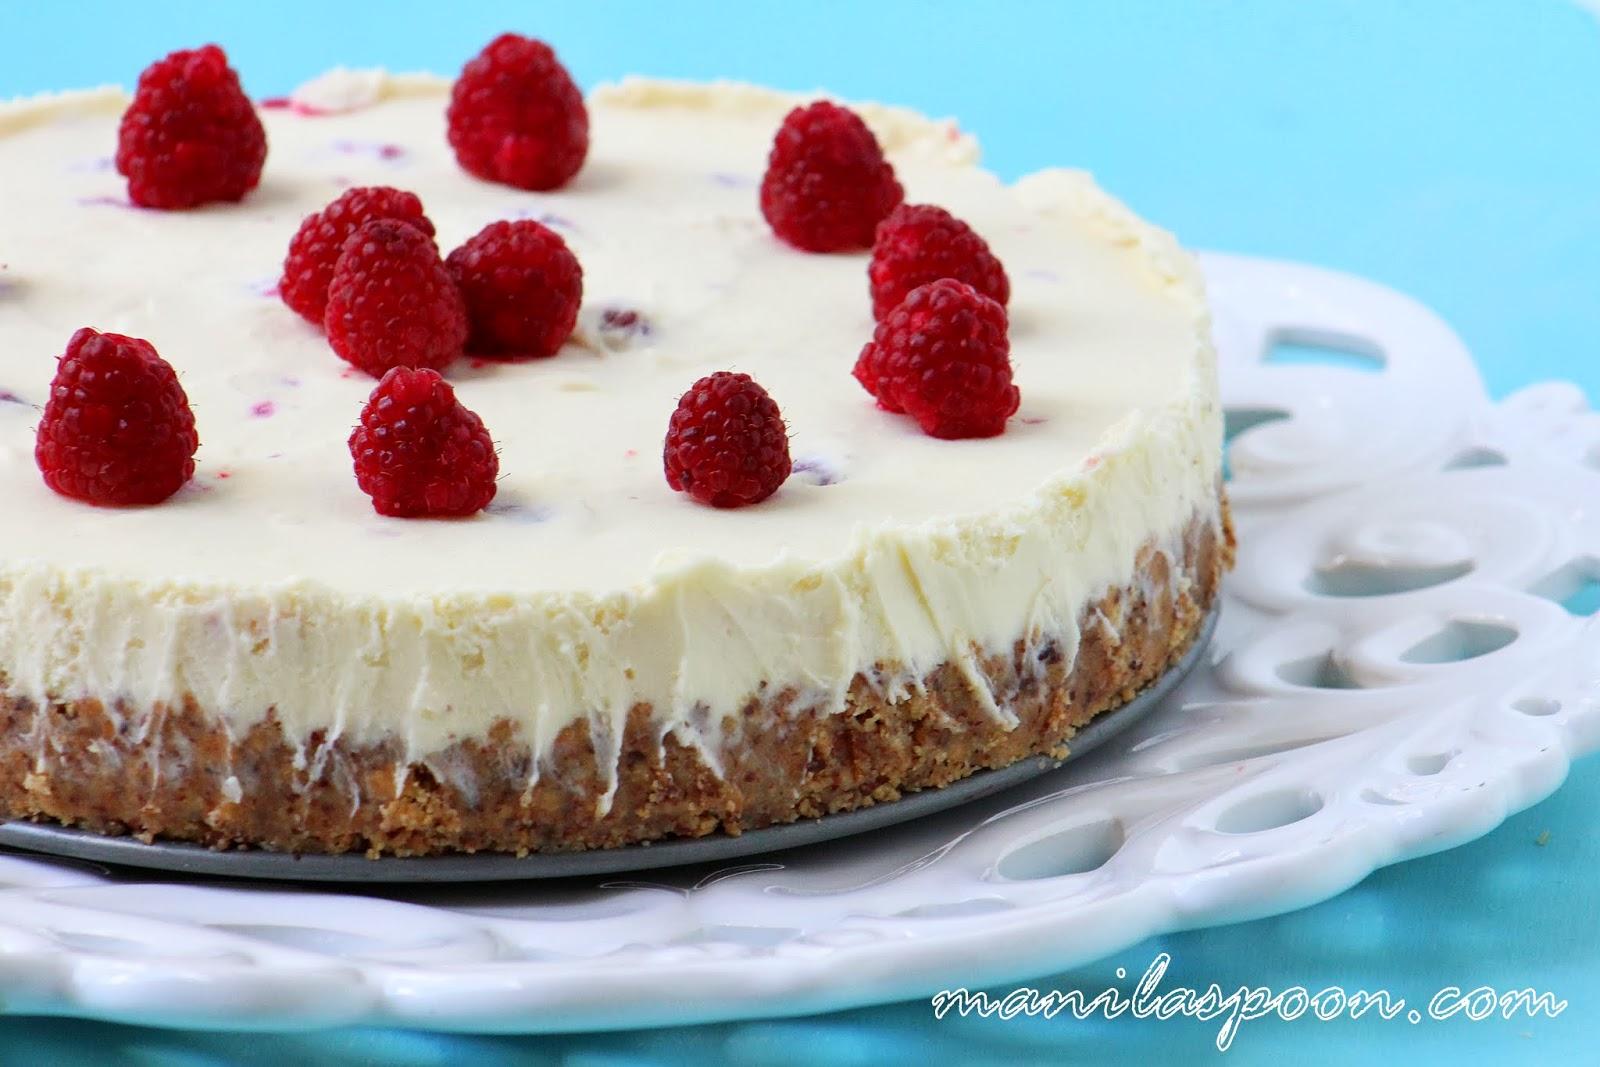 ... BAKE White Chocolate Raspberry Cheesecake with fresh Raspberry Coulis